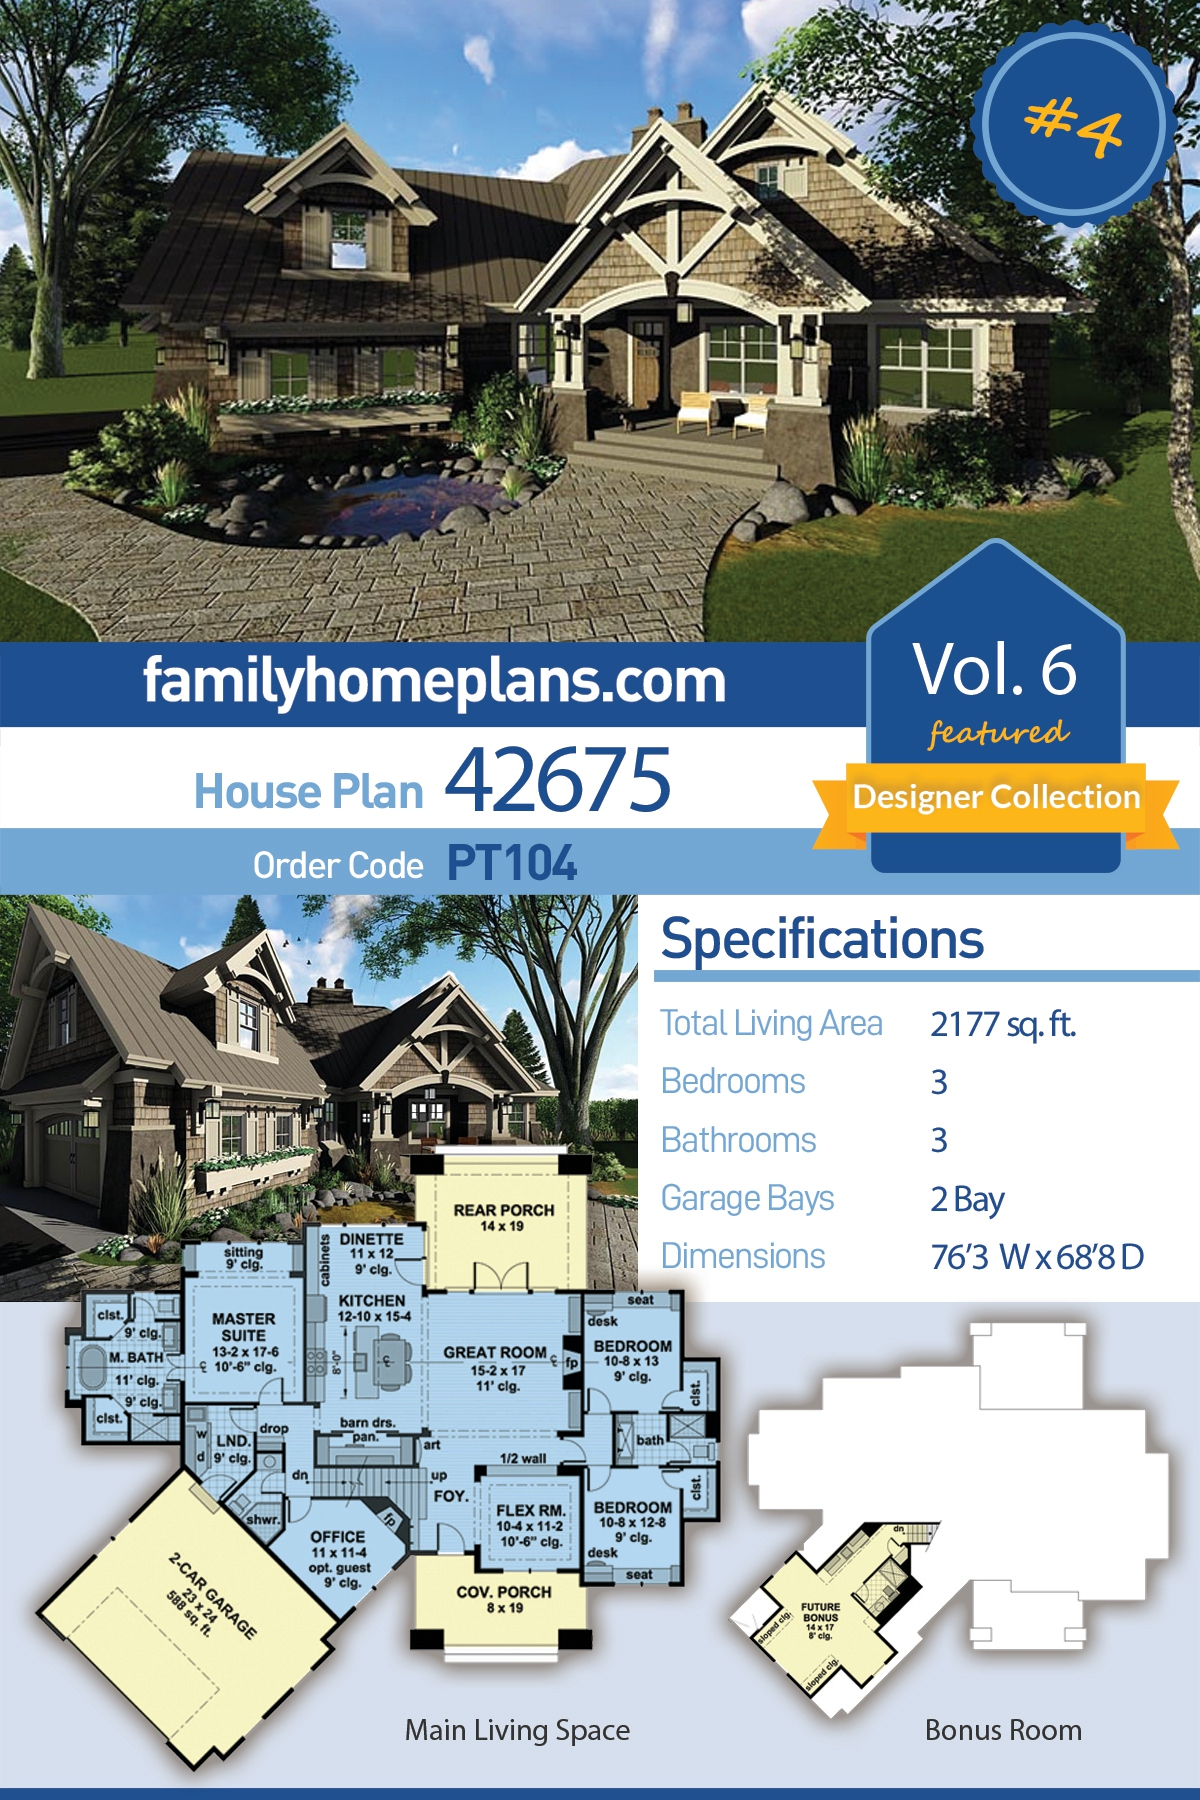 Bungalow, Cottage, Craftsman, Tudor House Plan 42675 with 3 Beds, 3 Baths, 2 Car Garage